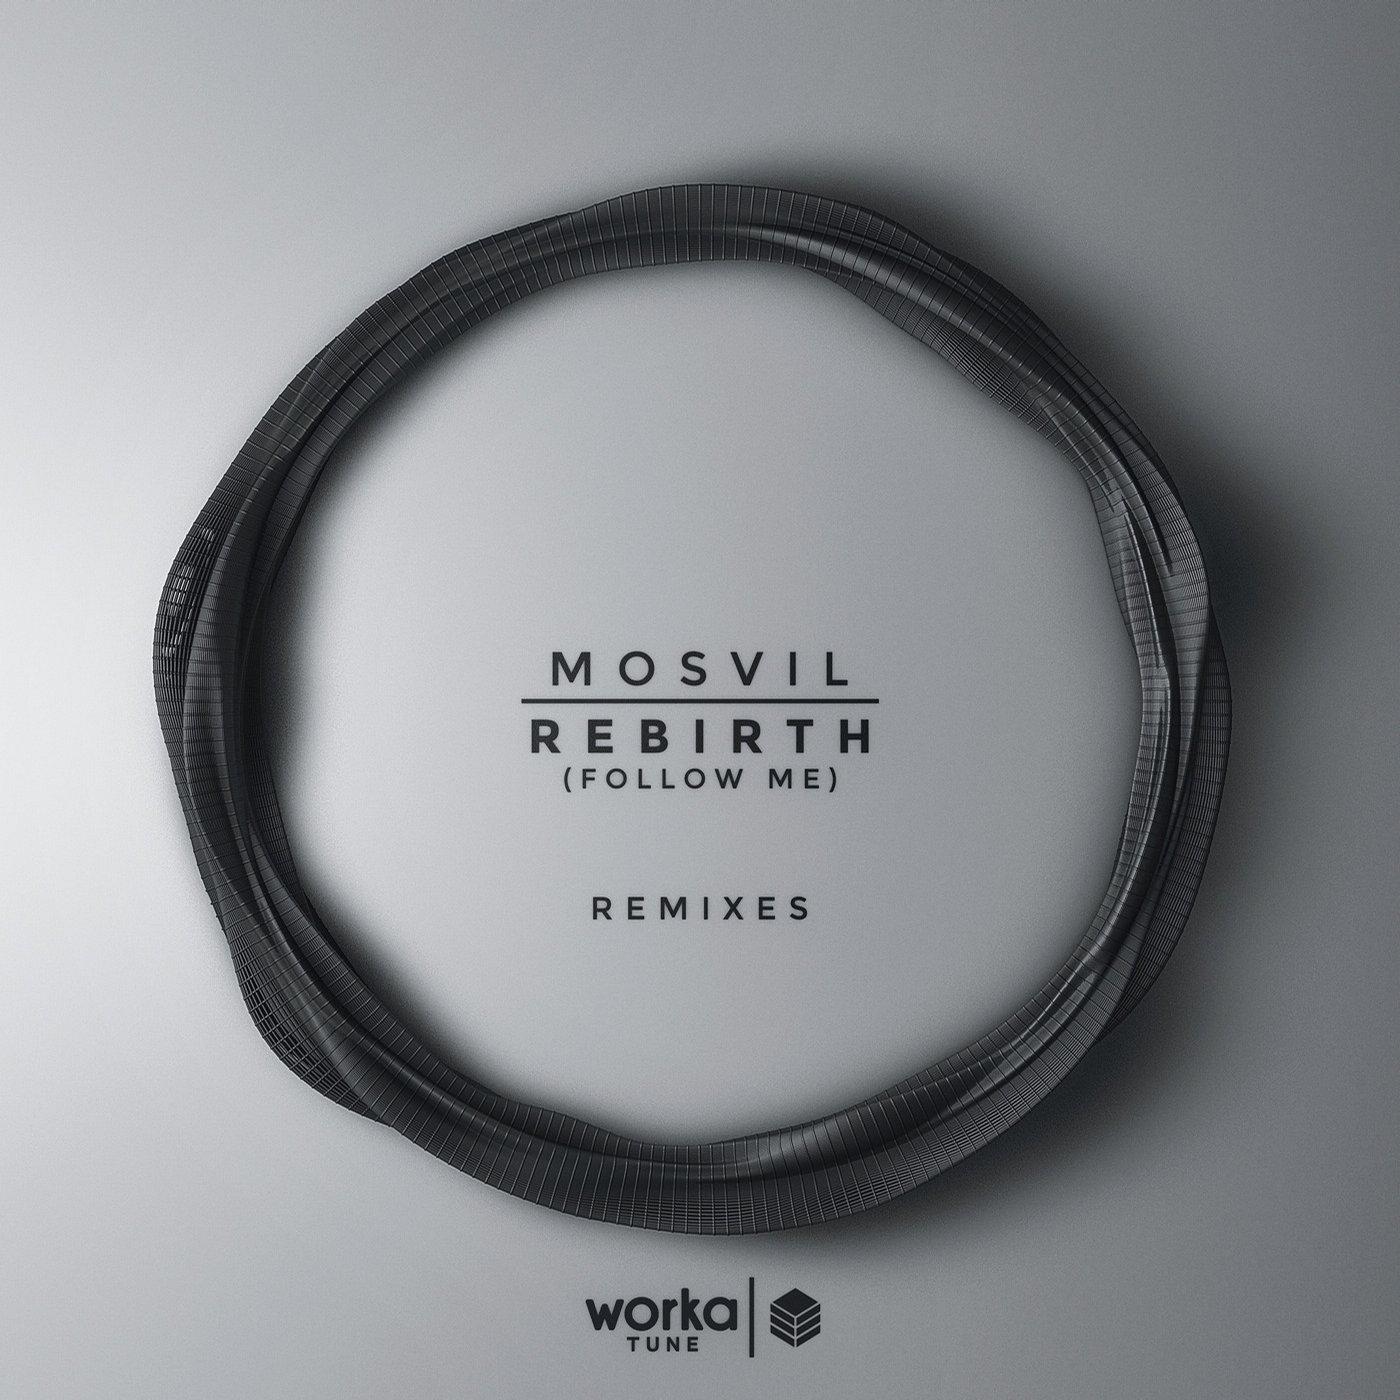 mosvil rebirth follow me remix gaba jim cerrano worka tune wt 0022